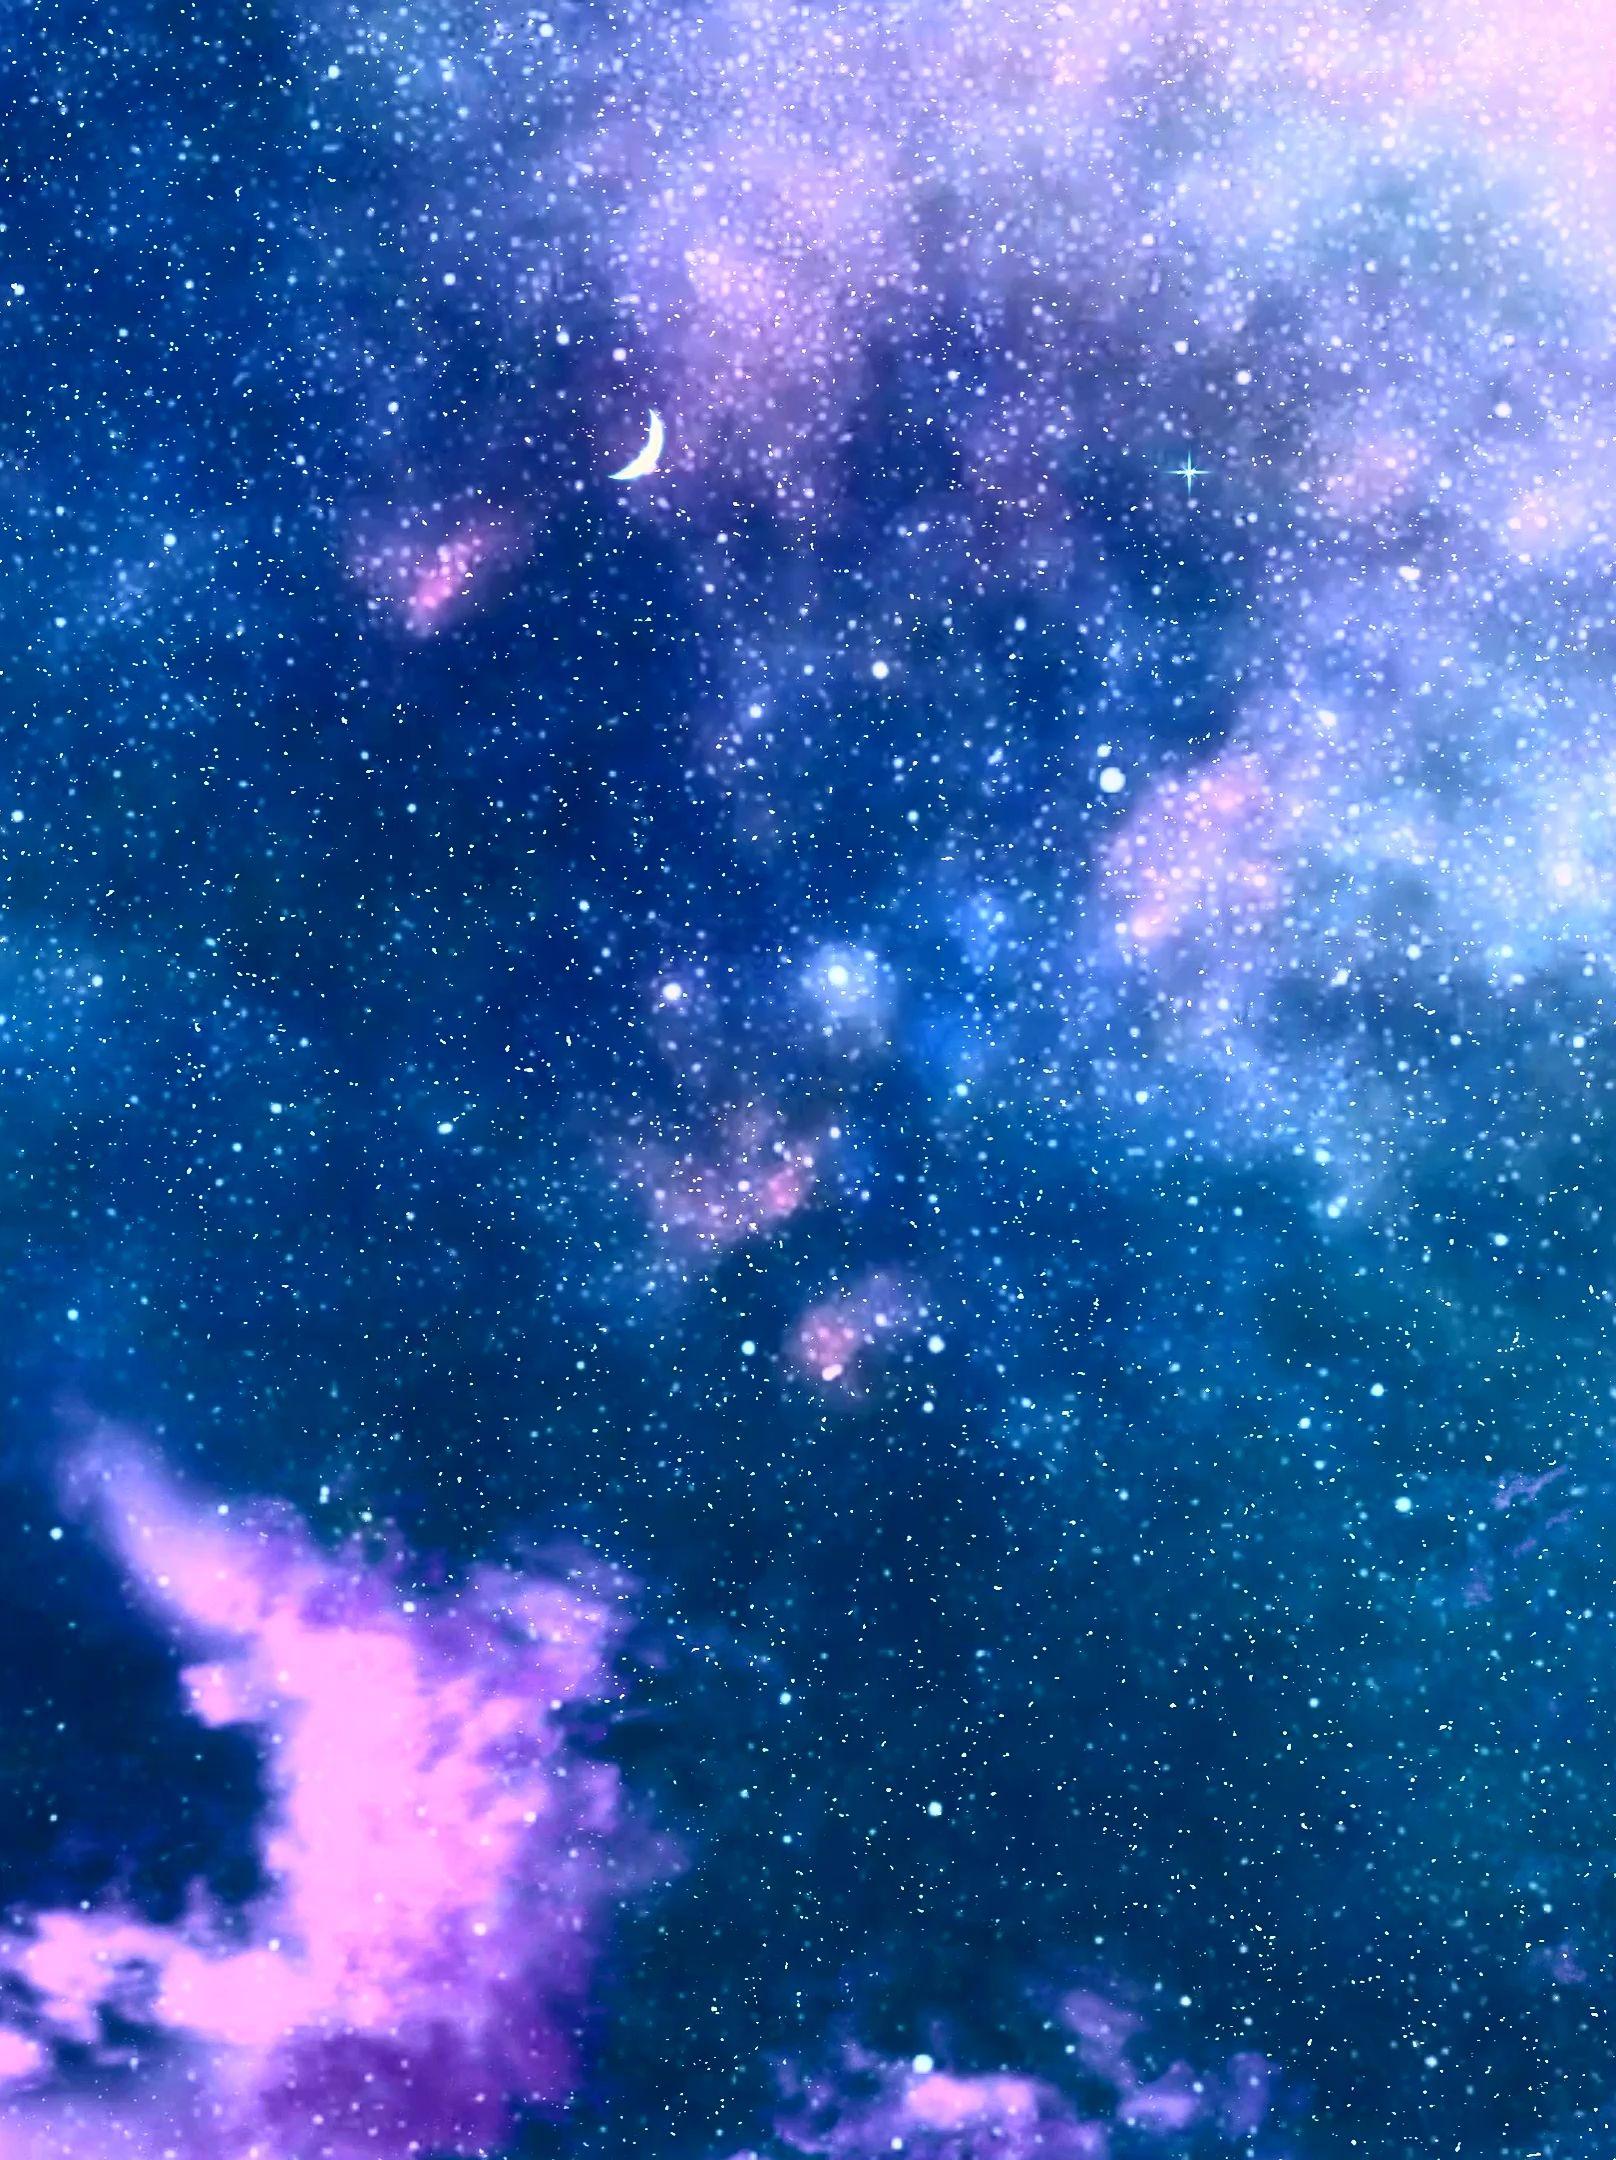 Galaxy Video Galaxy Wallpaper Galaxies Wallpaper Galaxy Wallpaper Iphone